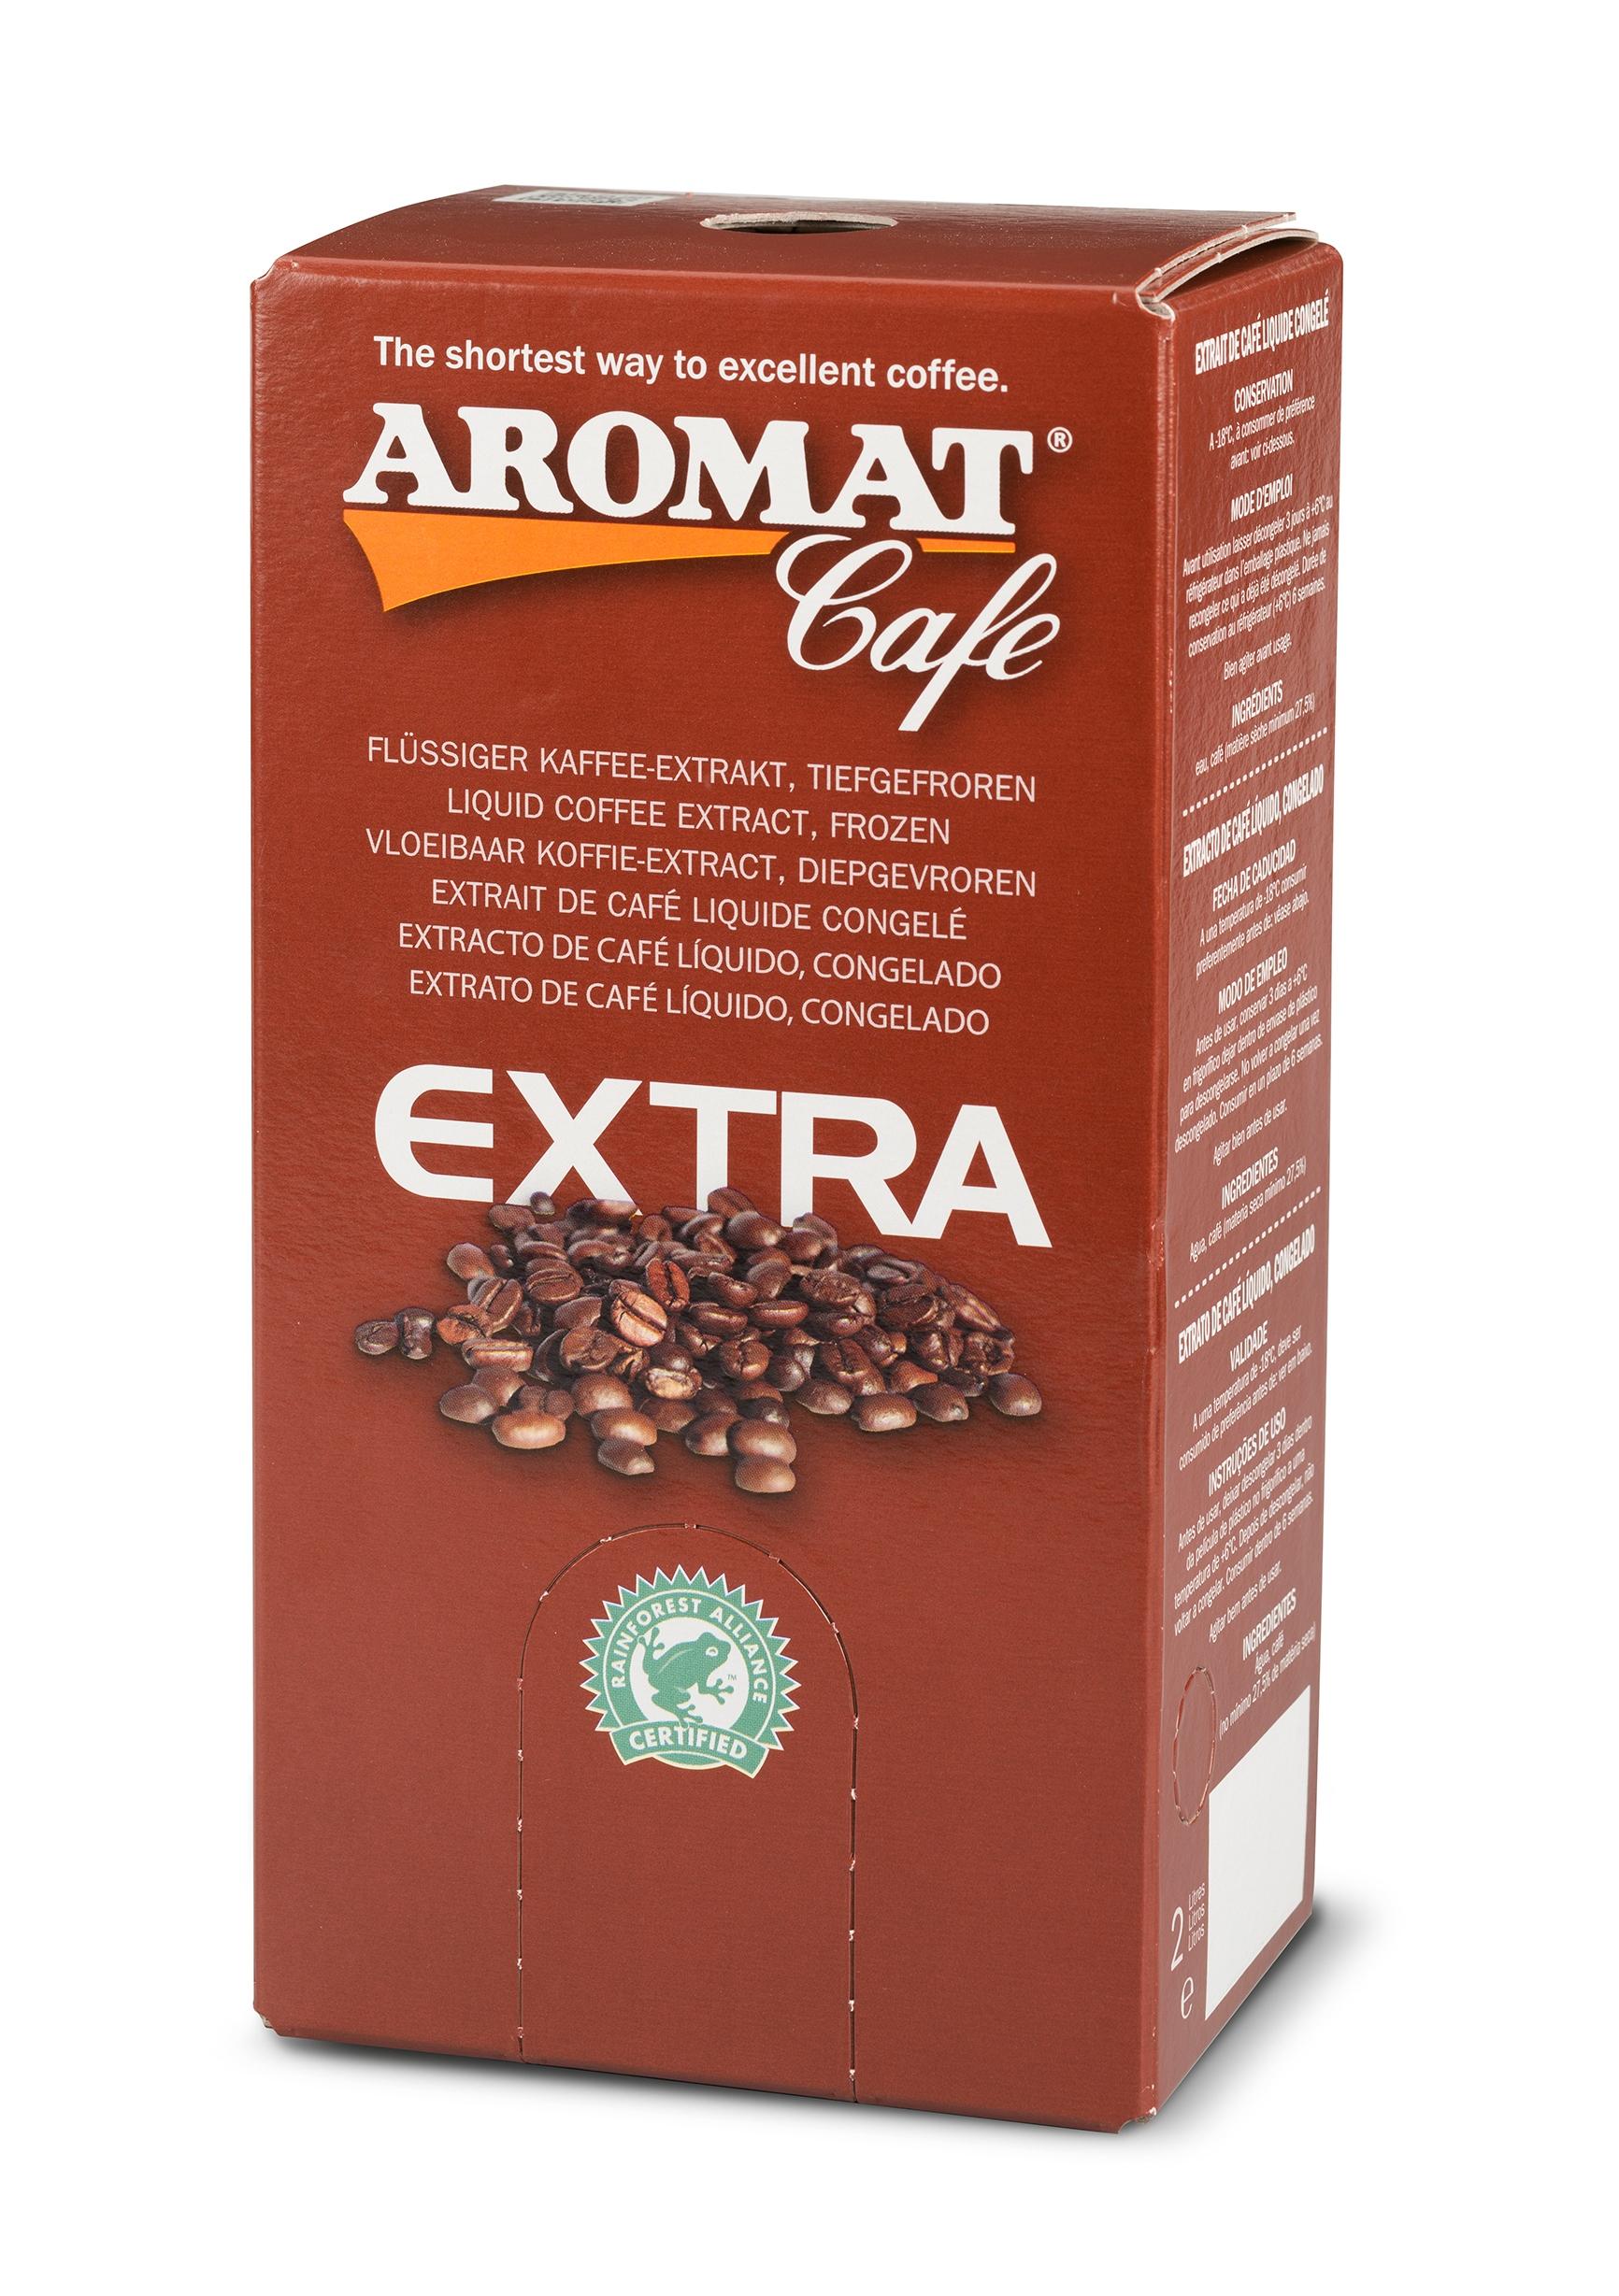 AROMAT Cafe EXTRA